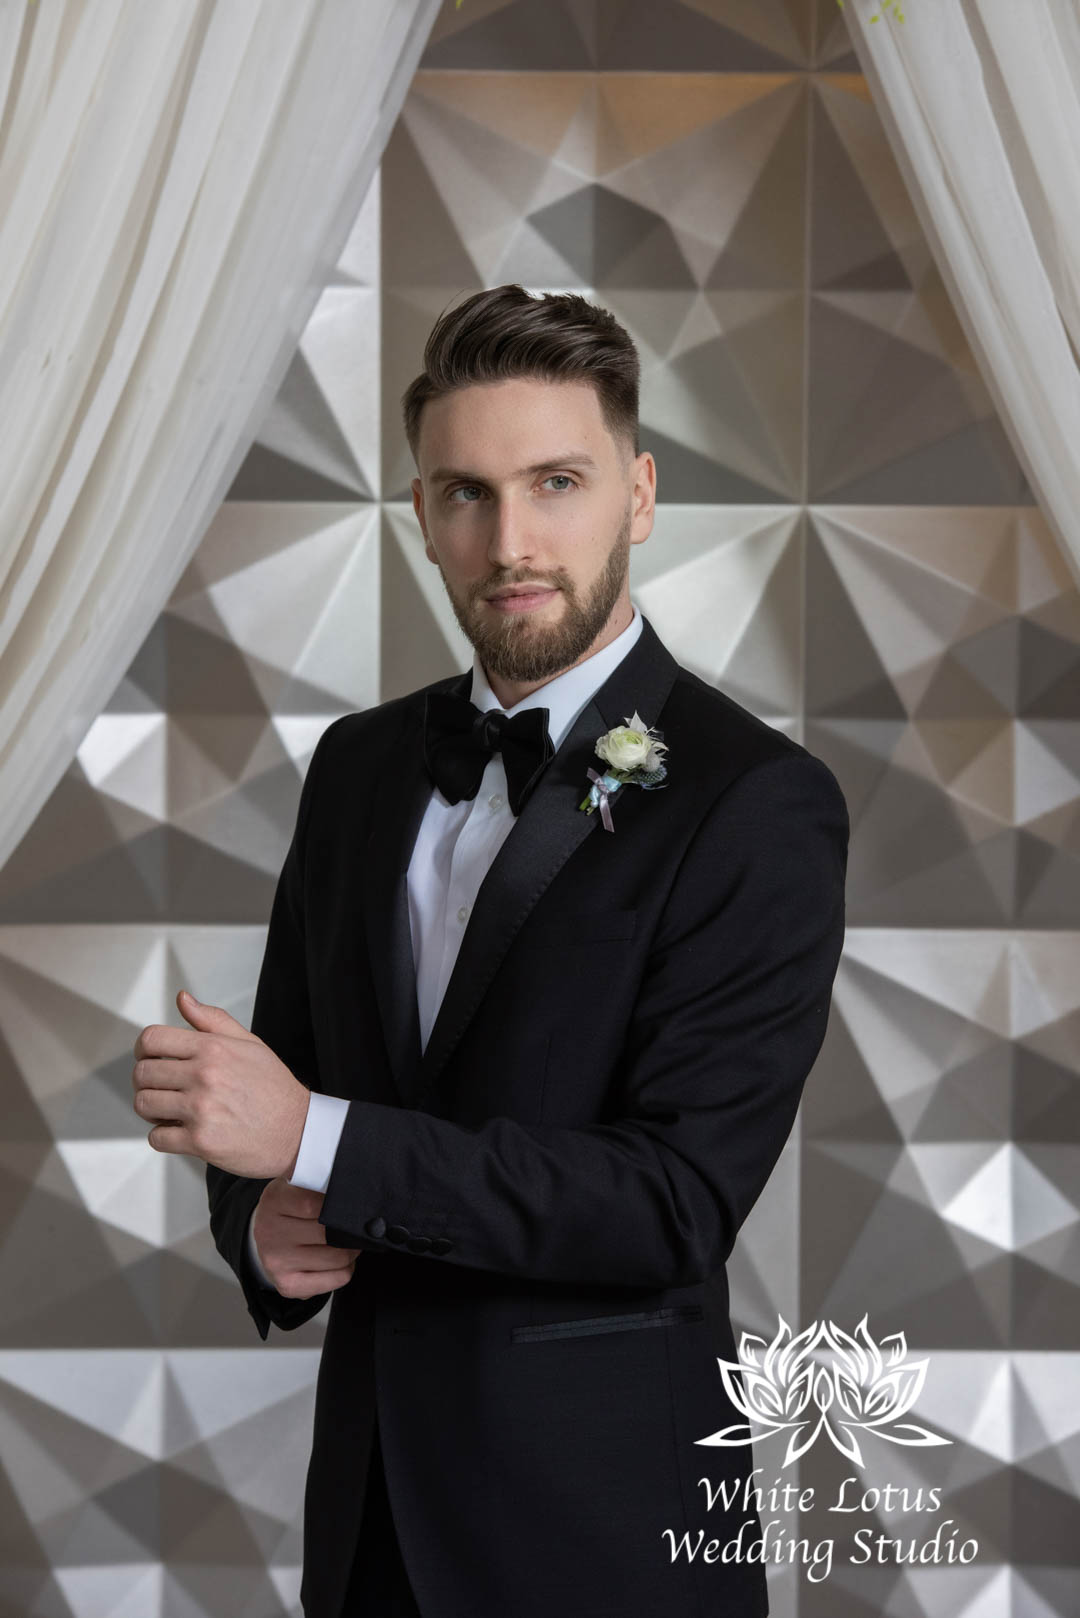 018- GLAM WINTERLUXE WEDDING INSPIRATION